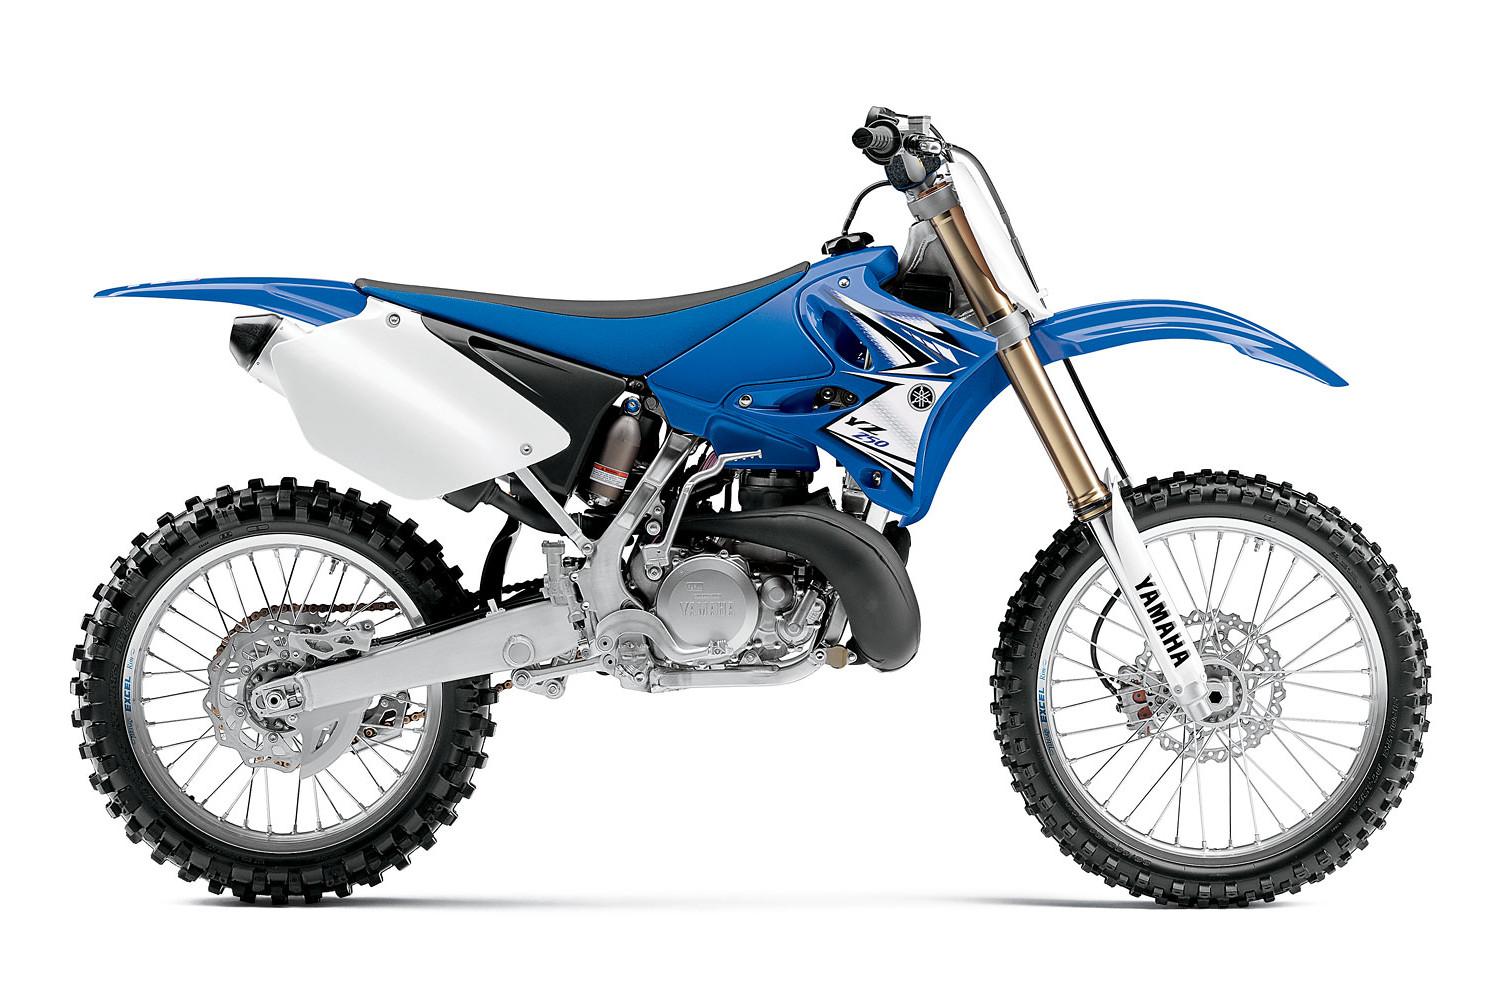 2011 Yamaha YZ250  11MS_YZ250_blu_S1_faabd4a2